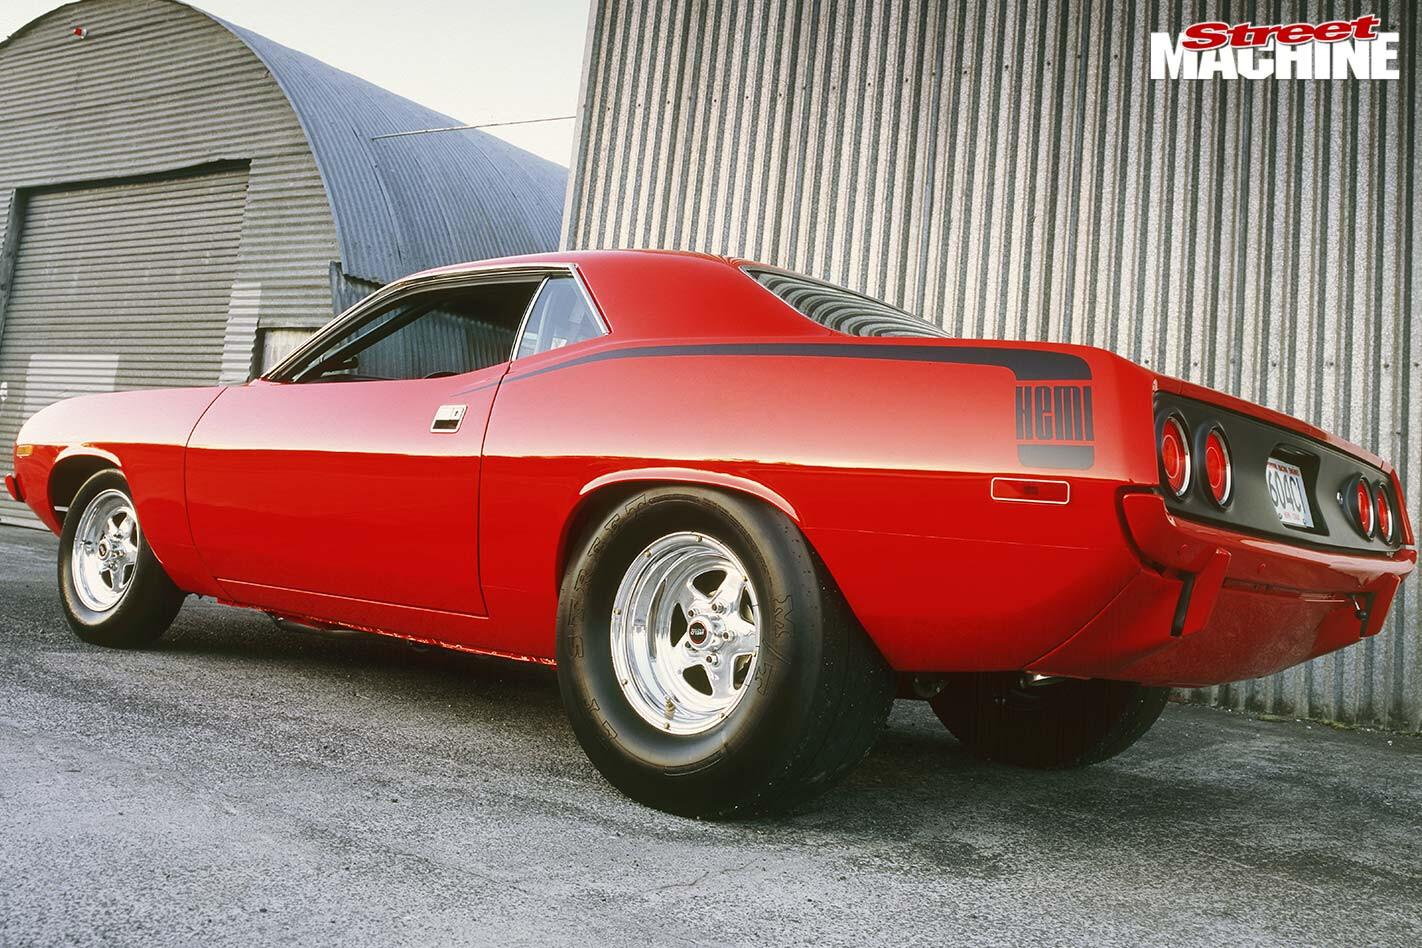 Plymouth Barracuda rear